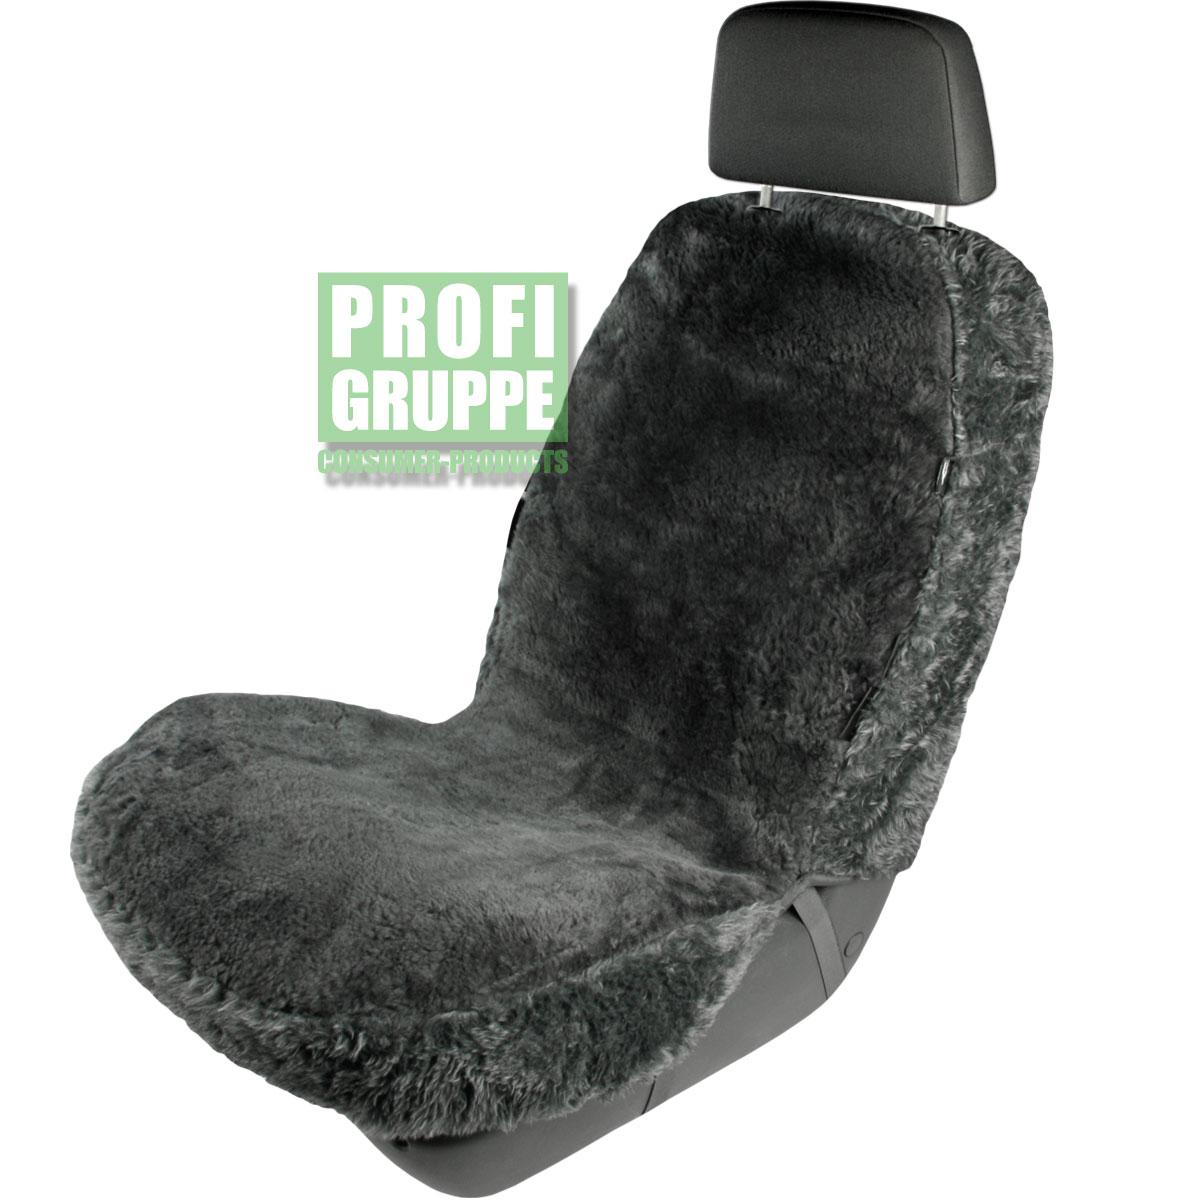 Lammfellbezug-Auto-PKW-Sitzbezug-Lammfell-Autositzbezug-Vollbezug-NEU